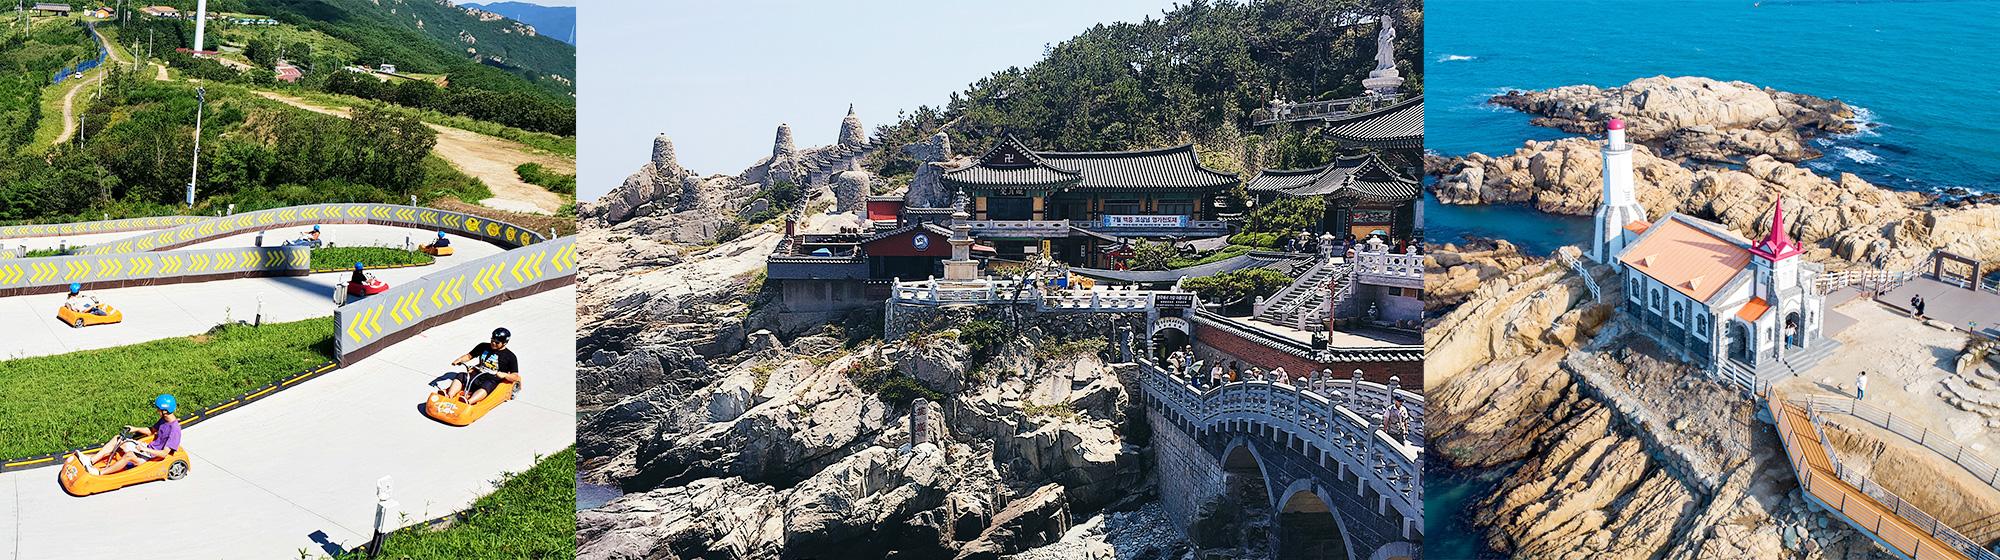 Busan City Full Day Tour – Enjoy a Luge Ride, Yonggungsa Temple and more – From Busan (Tue, Fri) | KoreaTravelEasy